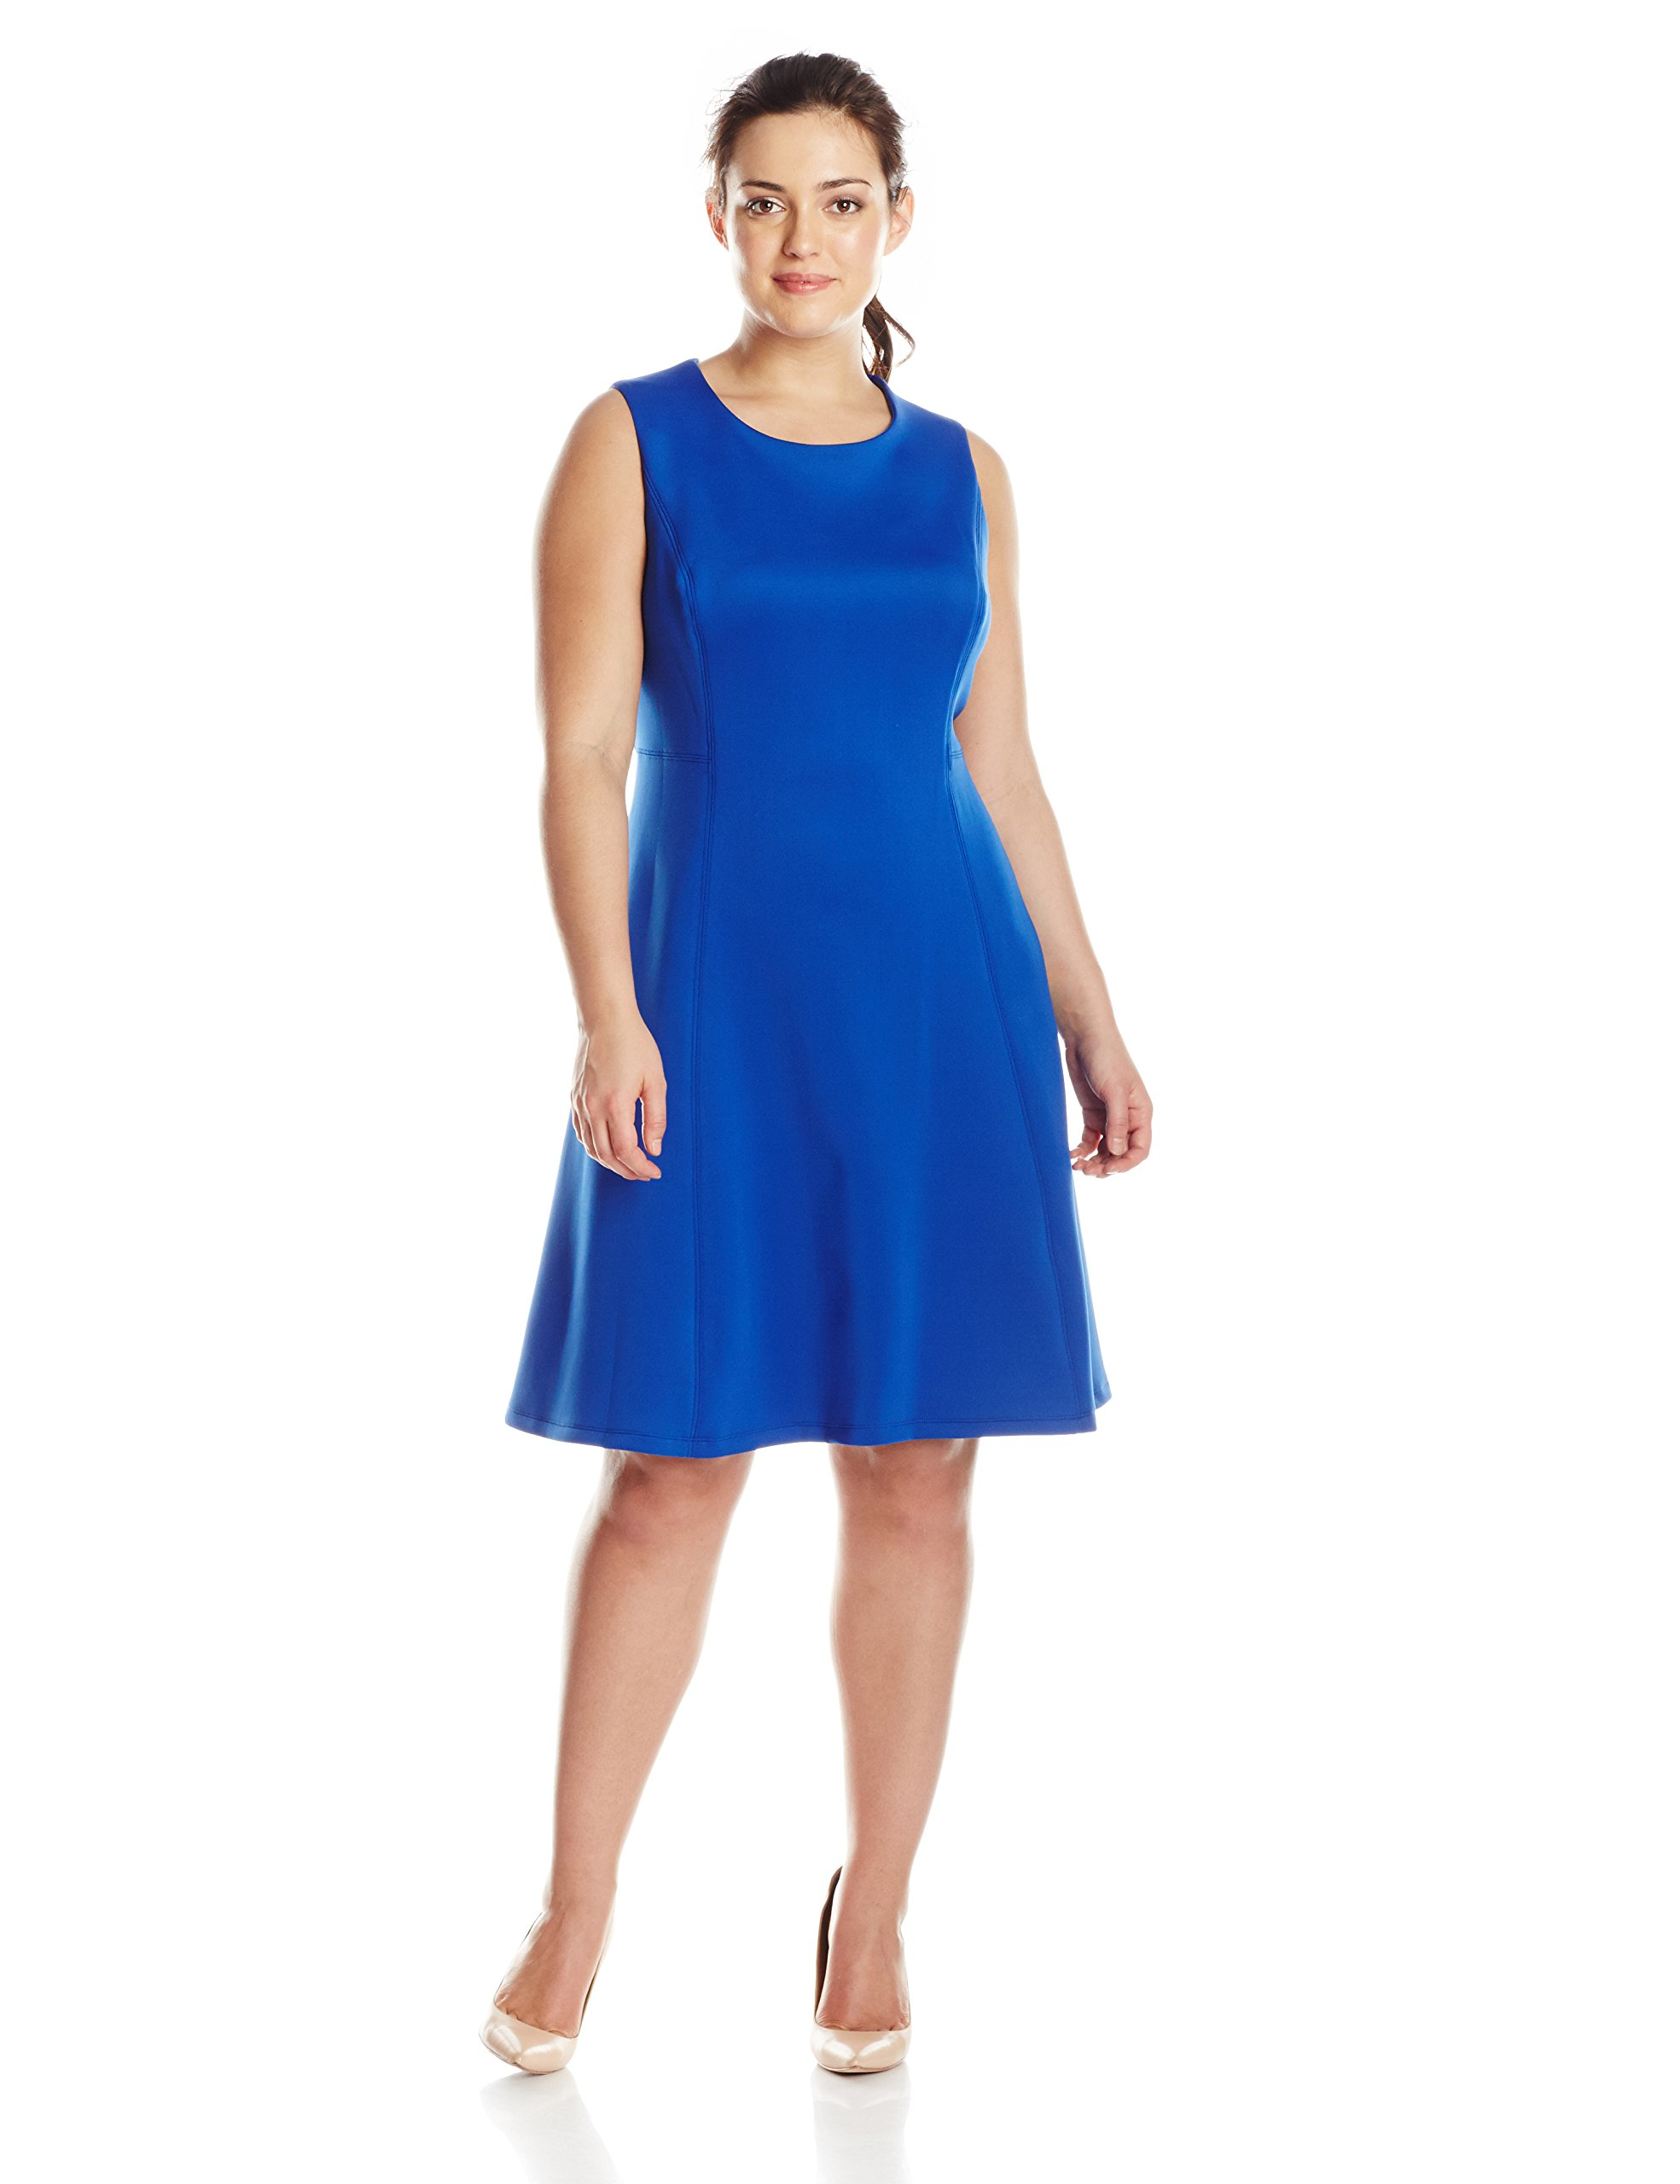 Calvin Klein Women's Plus-Size Regatta Fit and Flare Dress